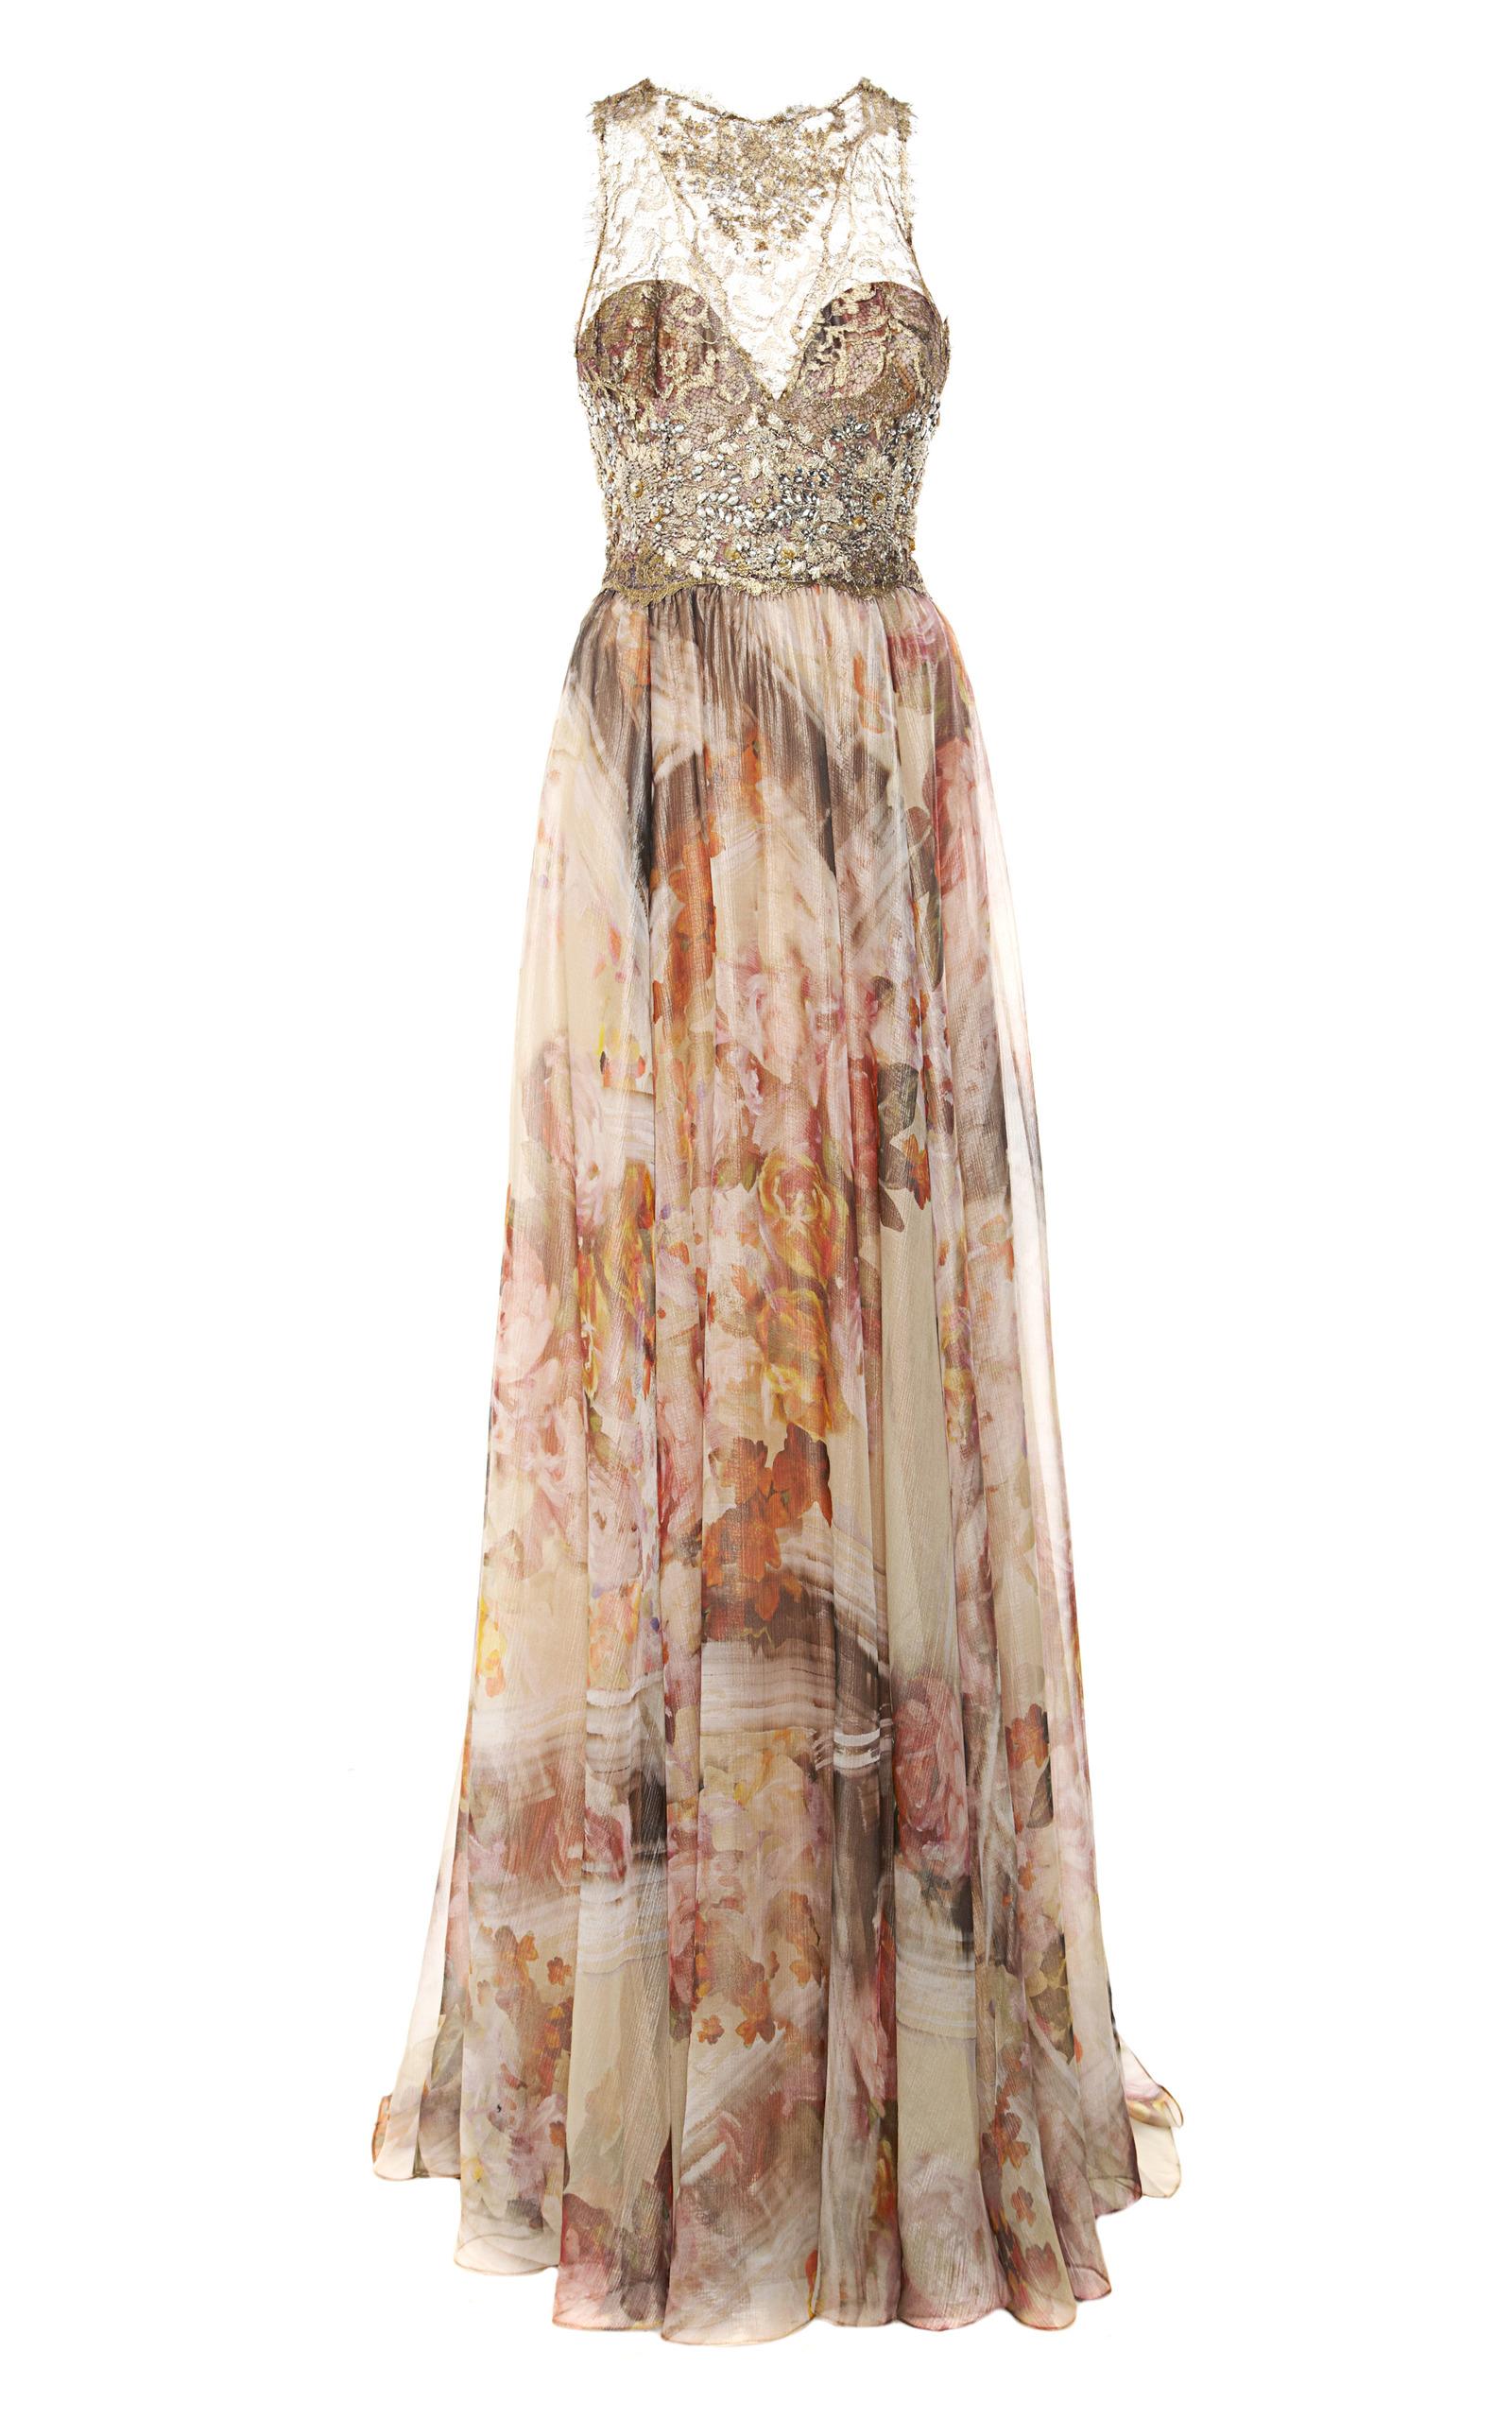 Moda Operandi   Gold Foil Printed Floral Chiffon Gown by Marchesa